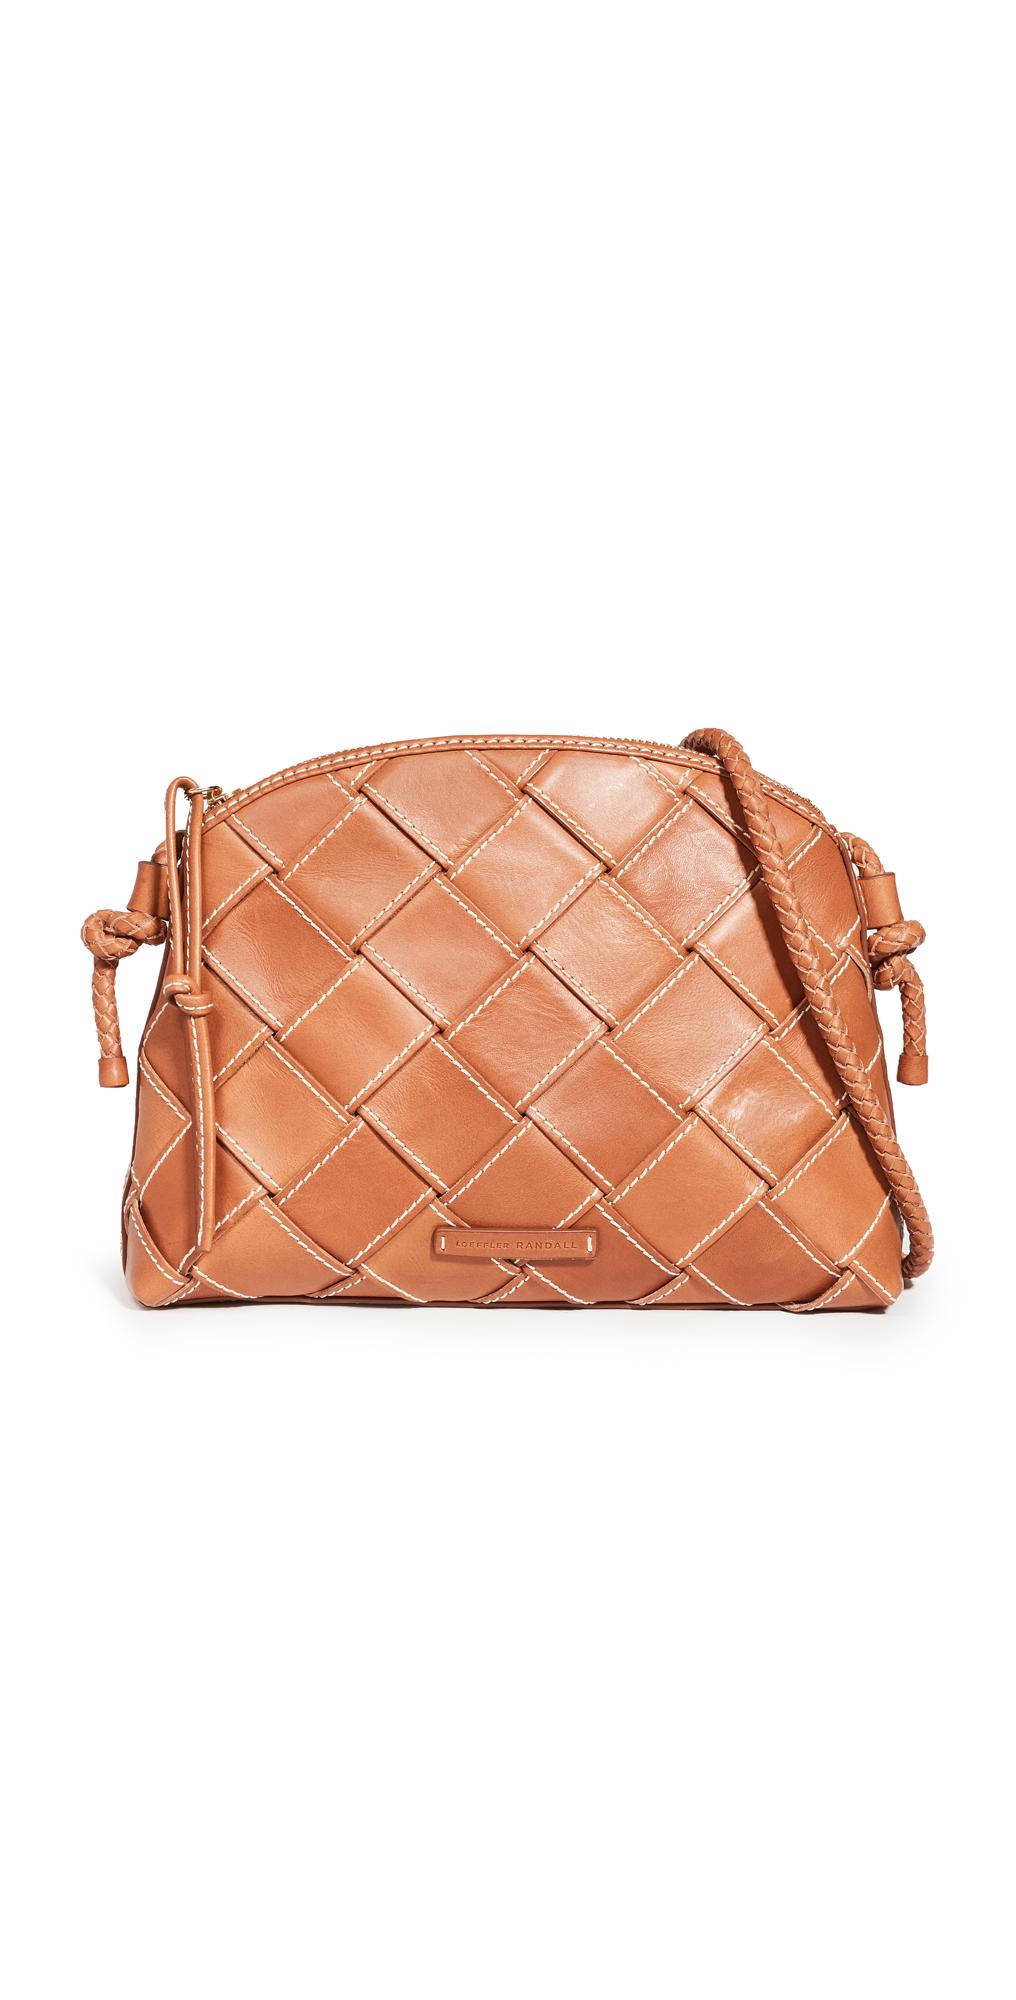 Loeffler Randall Mallory Woven Crossbody Bag